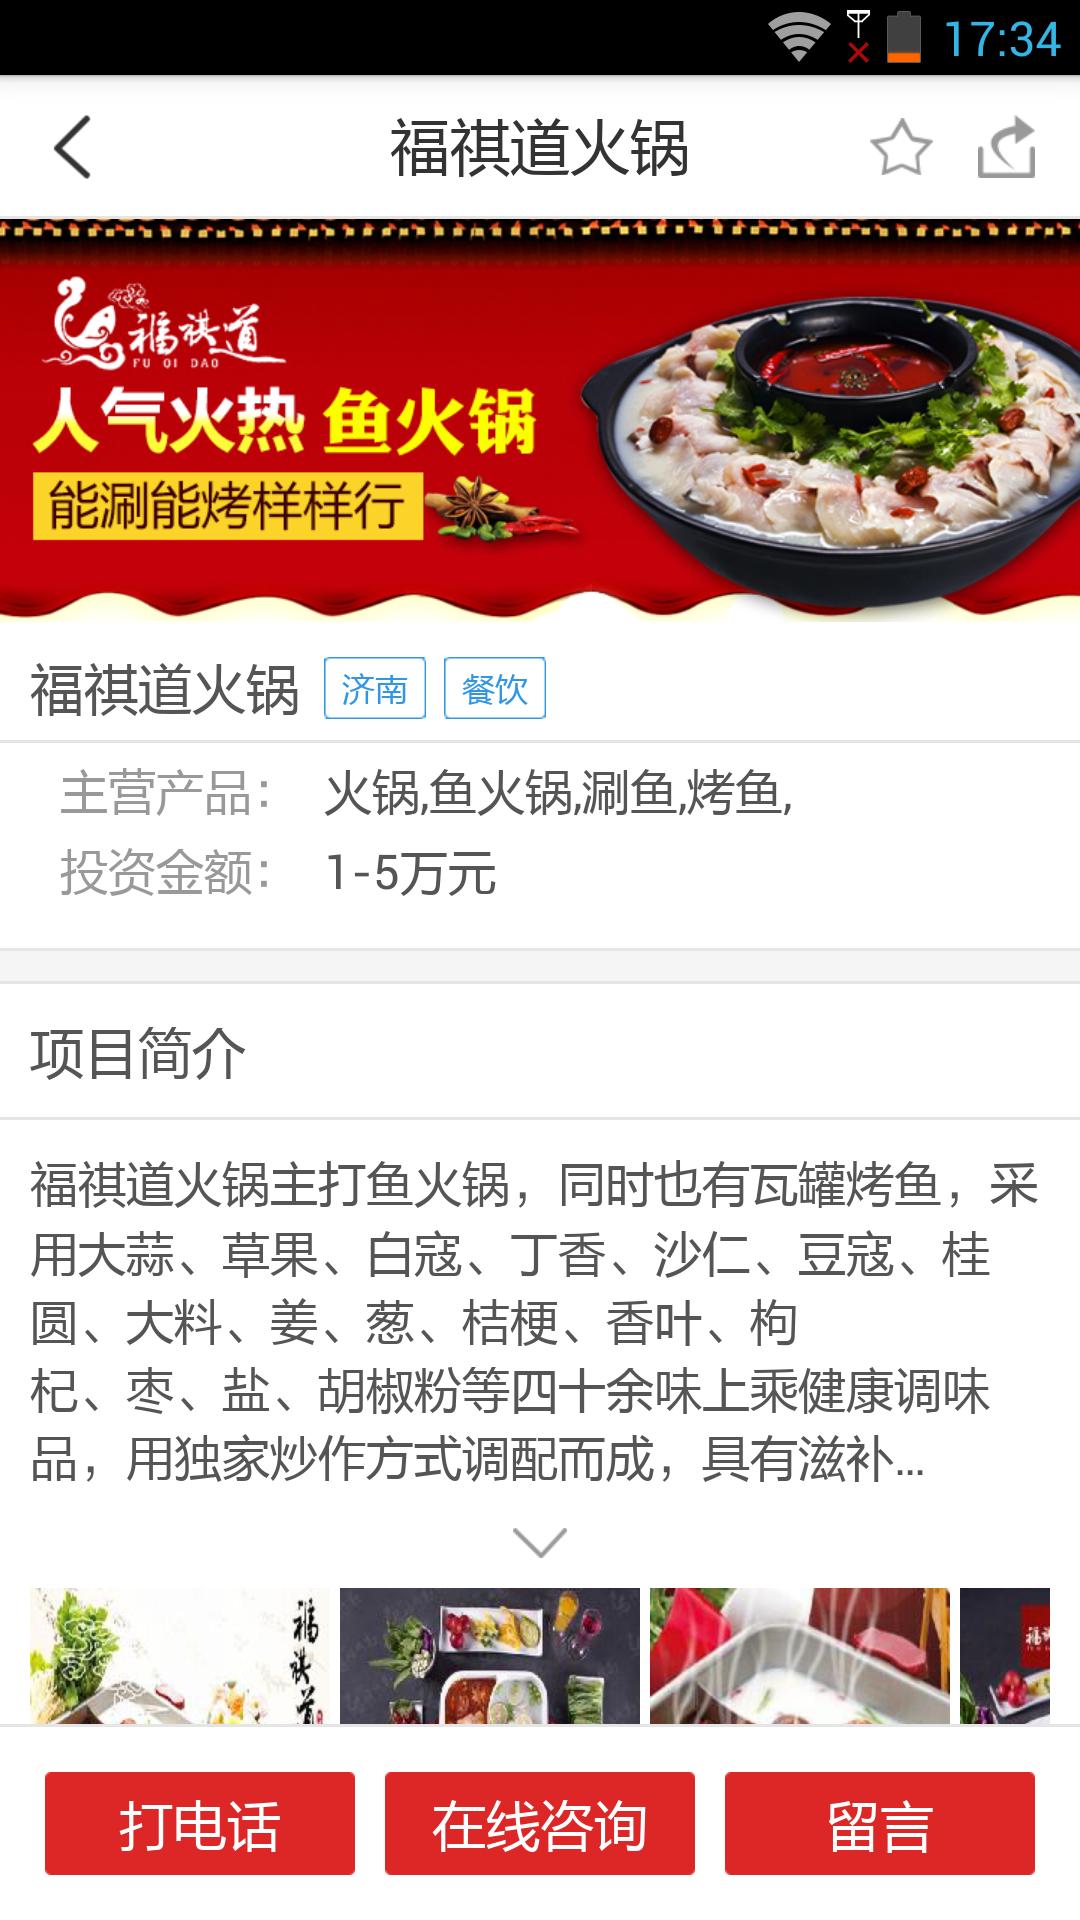 78.cn创业商机网截图2